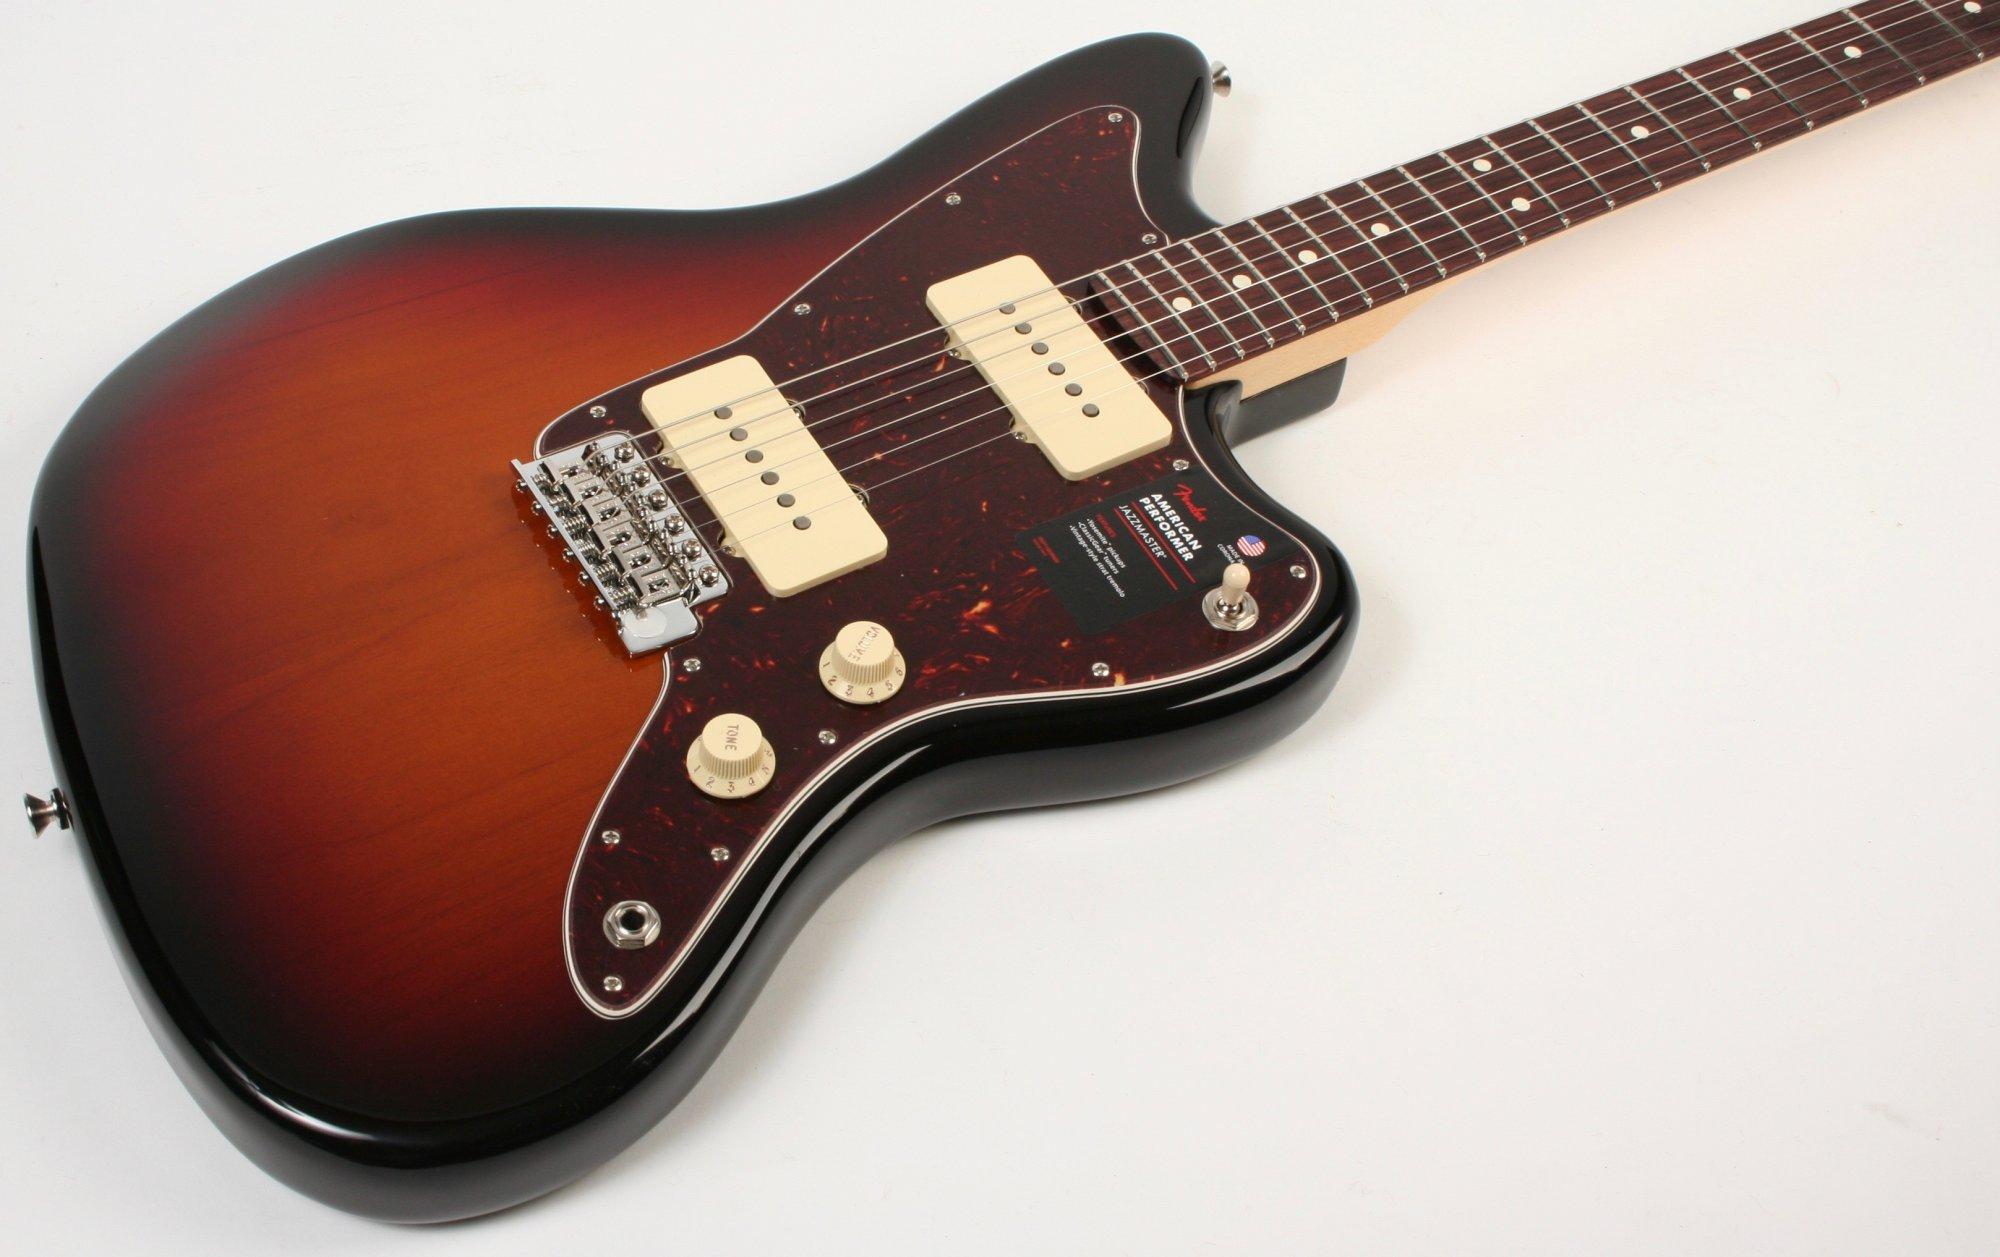 Fender American Performer Jazzmaster RW 3TSB